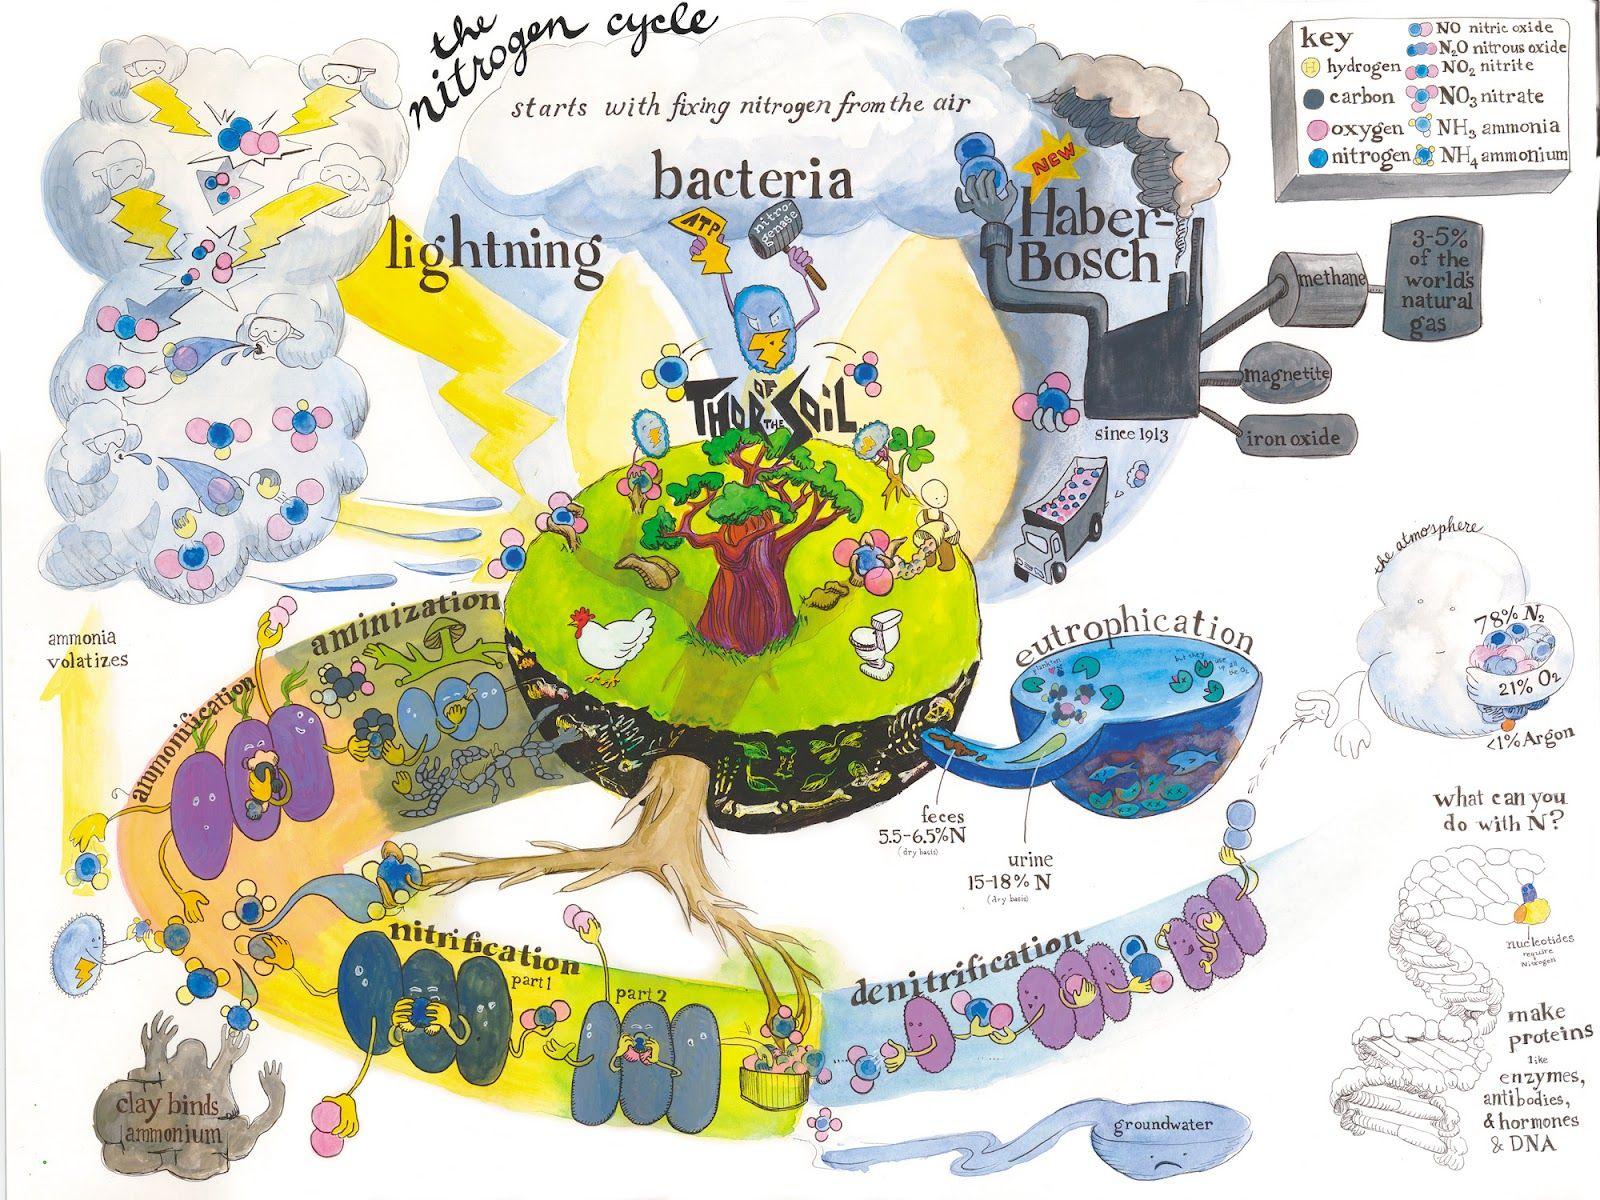 worksheet The Nitrogen Cycle Worksheet thenitrogencycle jpg environmental footprint infographic pinterest botany and ecology